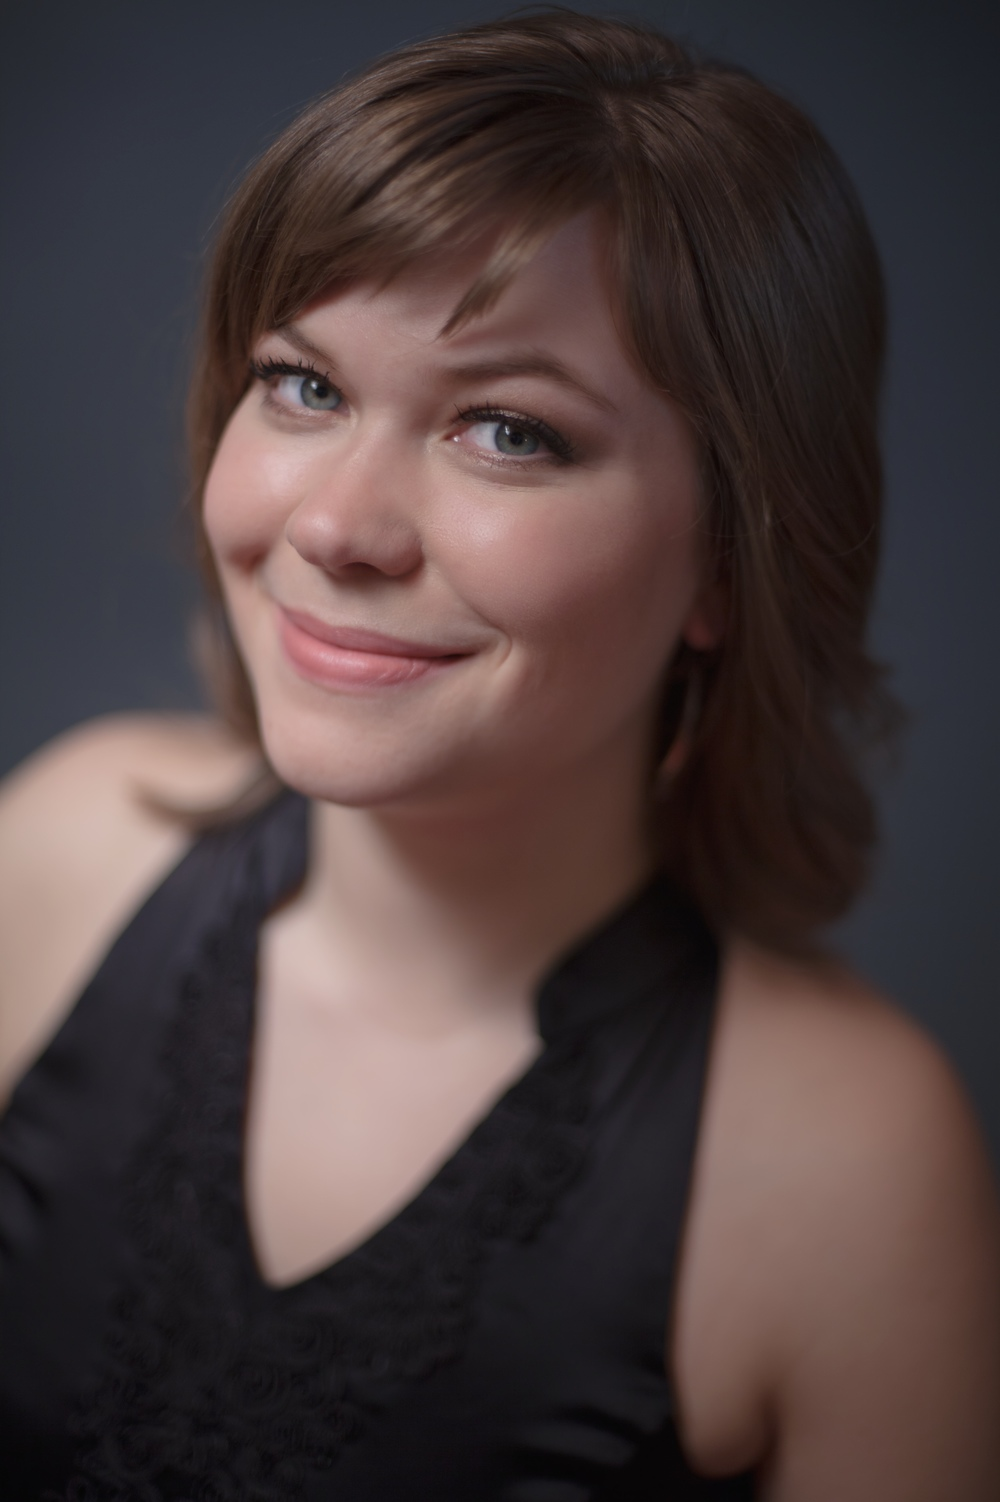 Alexa Raine-Wright